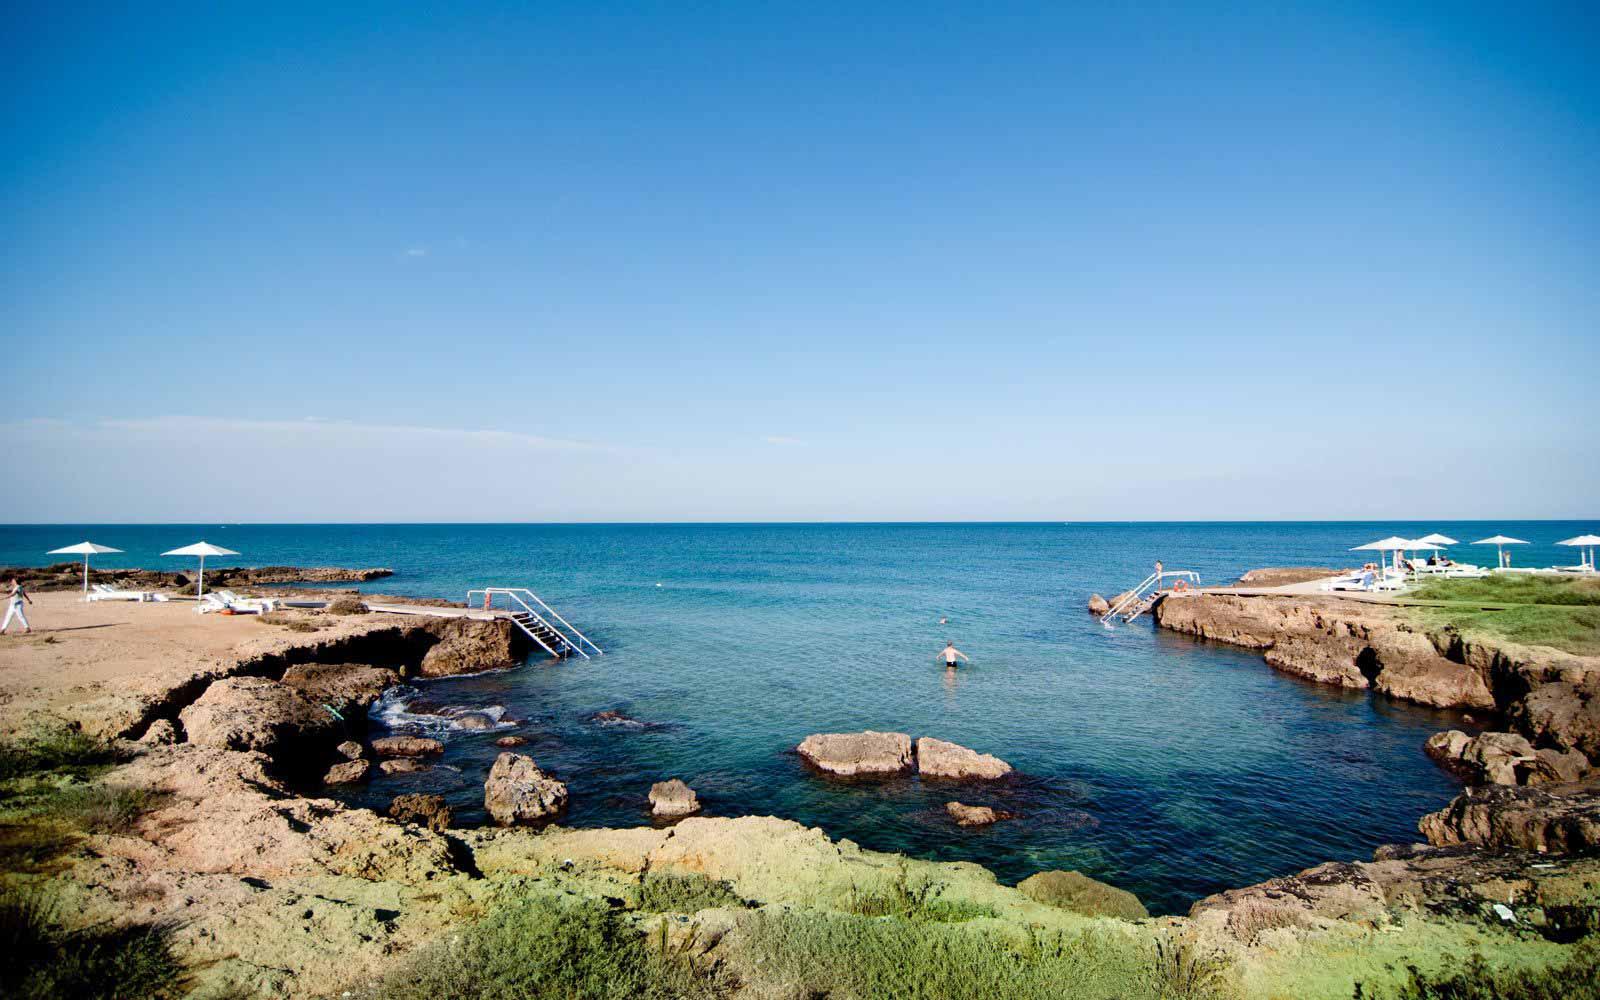 Cala Masciola Beach at Borgo Egnazia